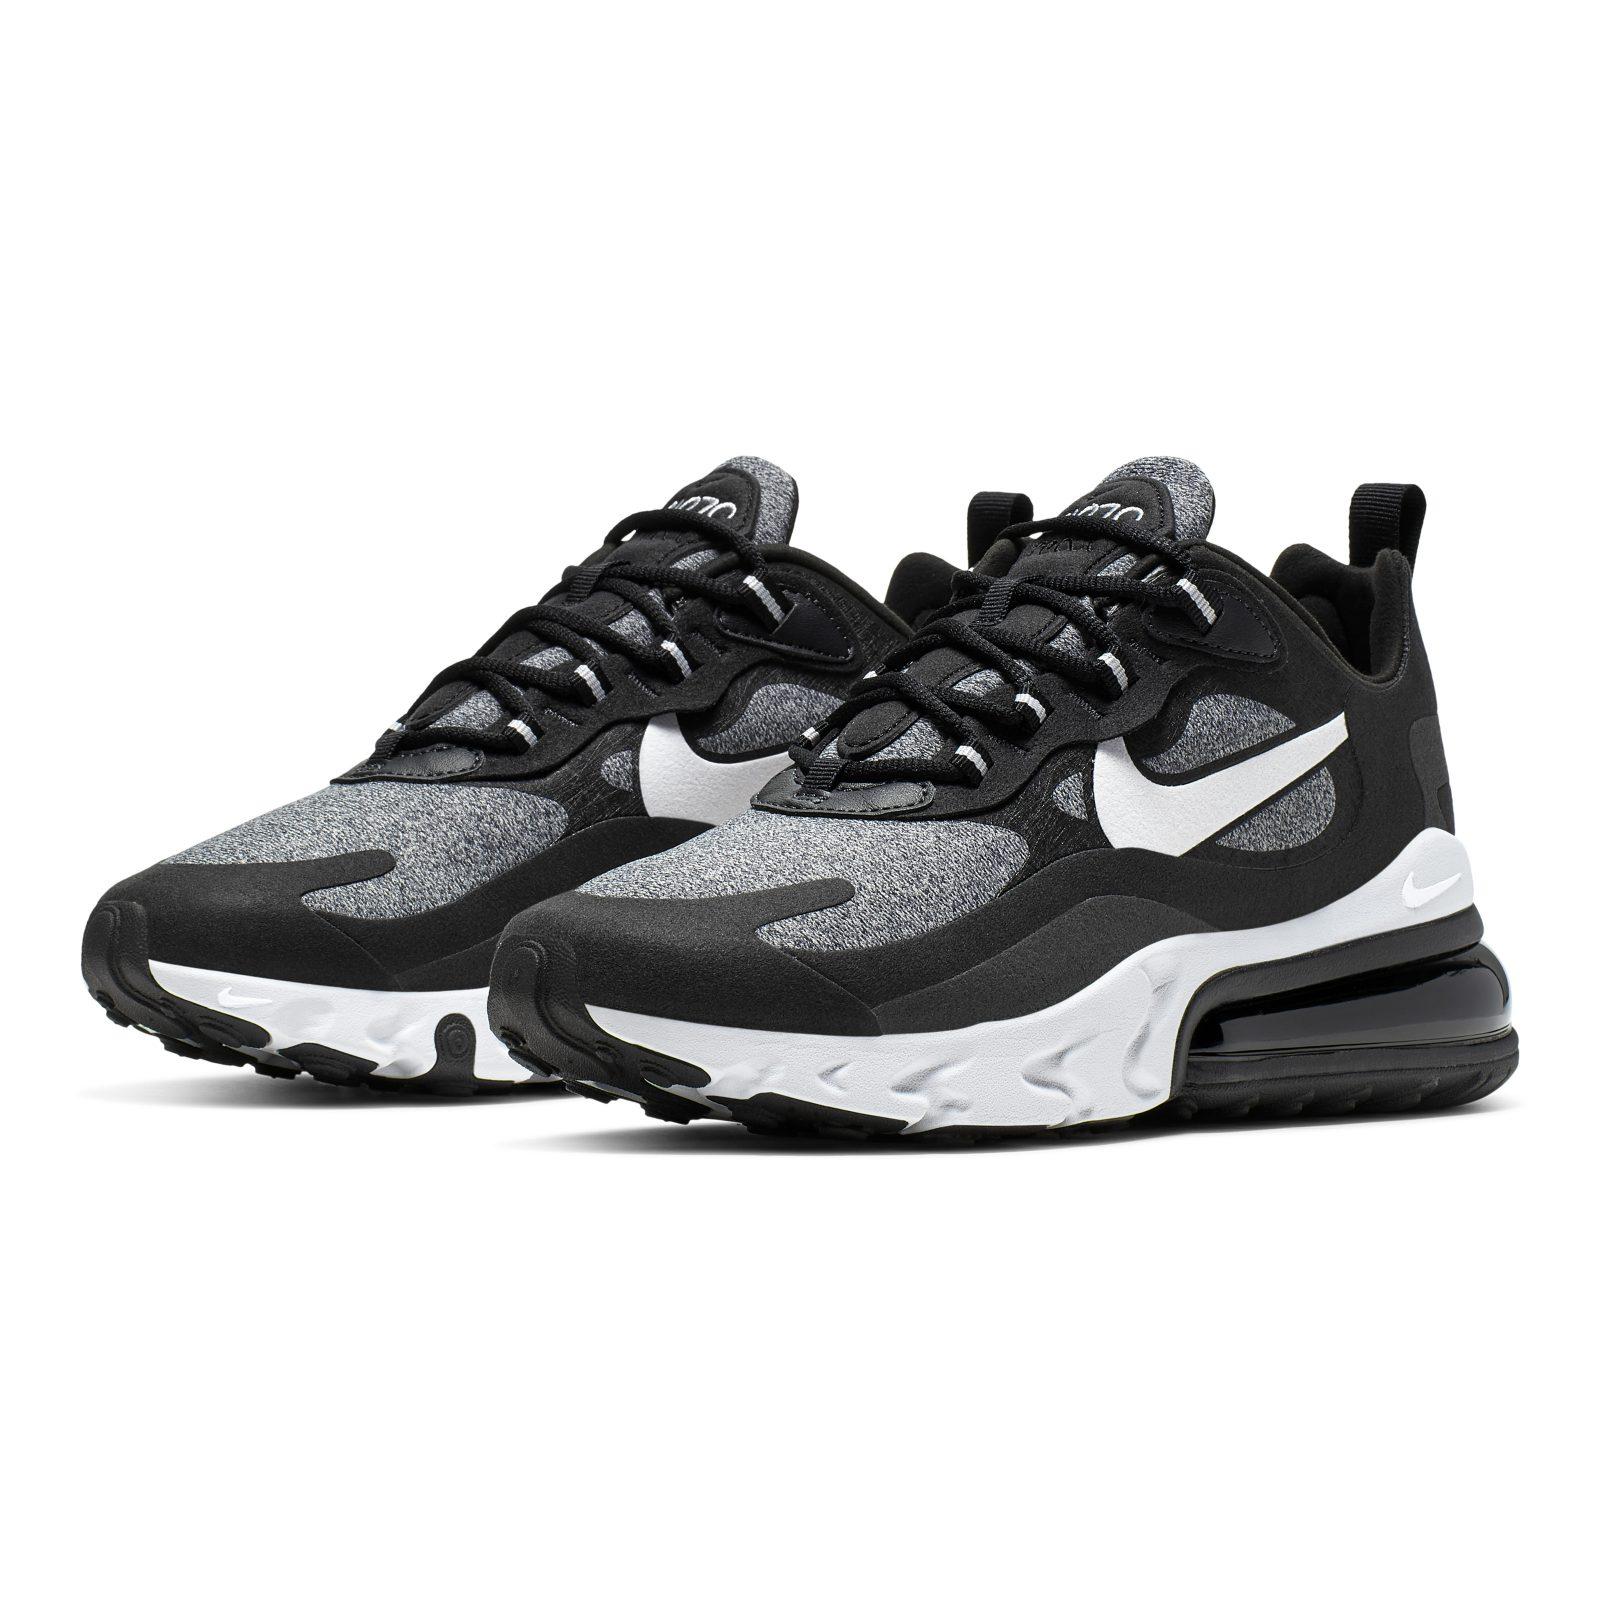 We Love The Nike Air Max 270 React Sneaker History